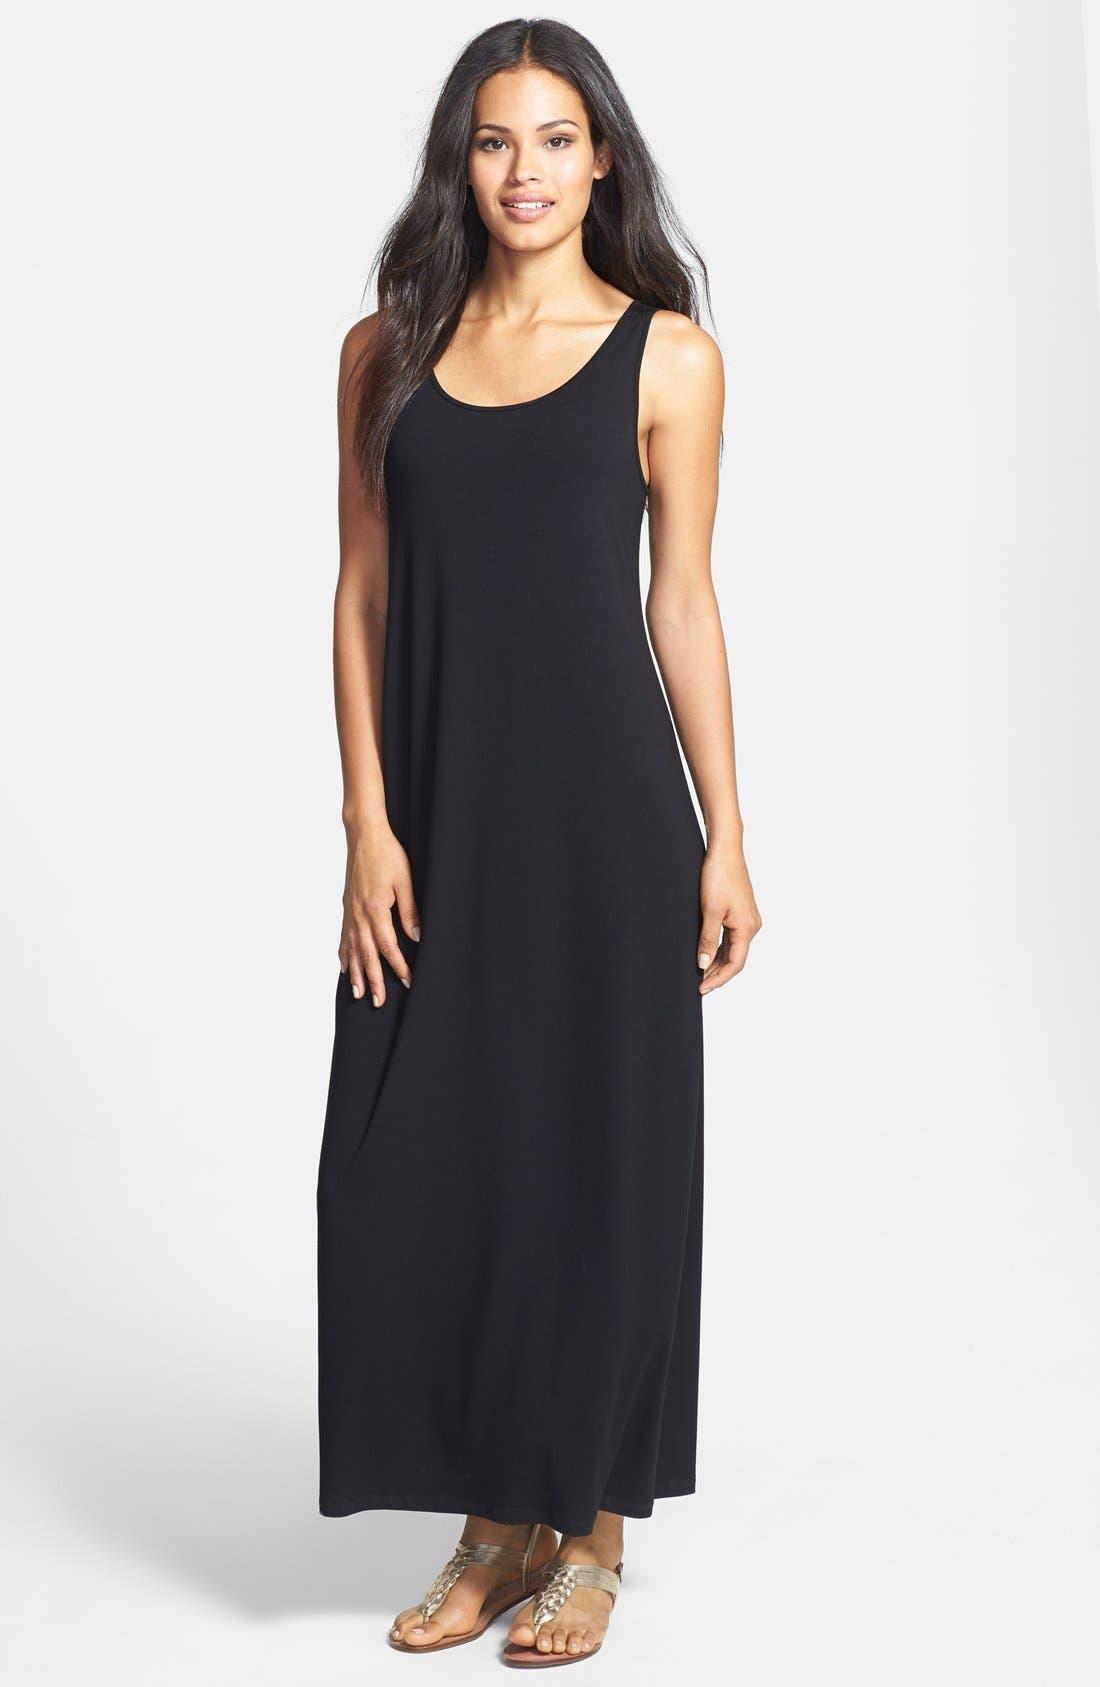 Alternate Image 1 Selected - Eileen Fisher Scoop Neck Jersey Dress (Petite)